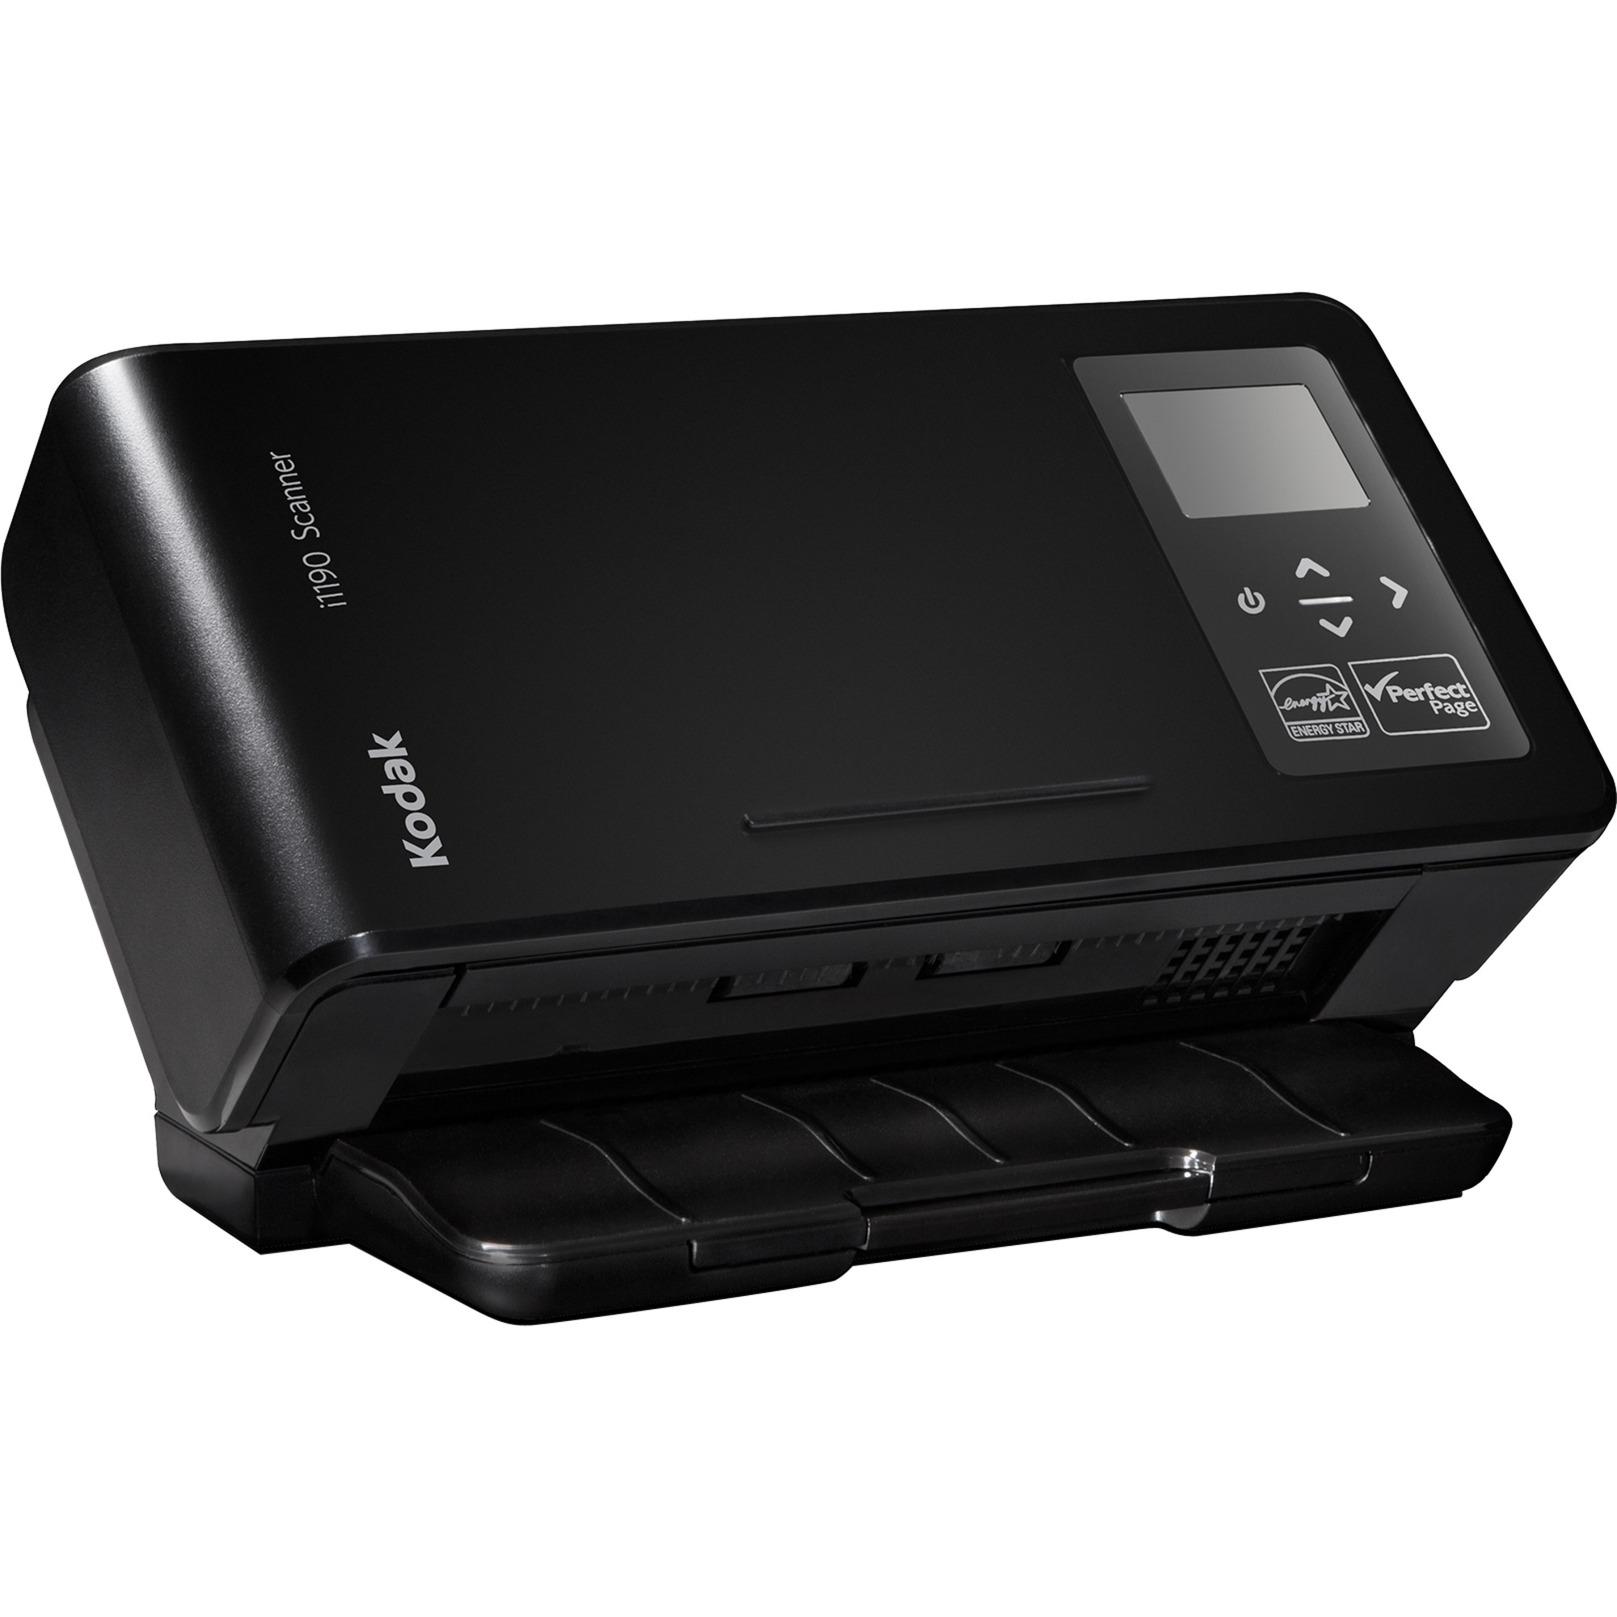 i1190 Scanner 600 x 600 DPI Escáner con alimentador automático de documentos (ADF) Negro A4